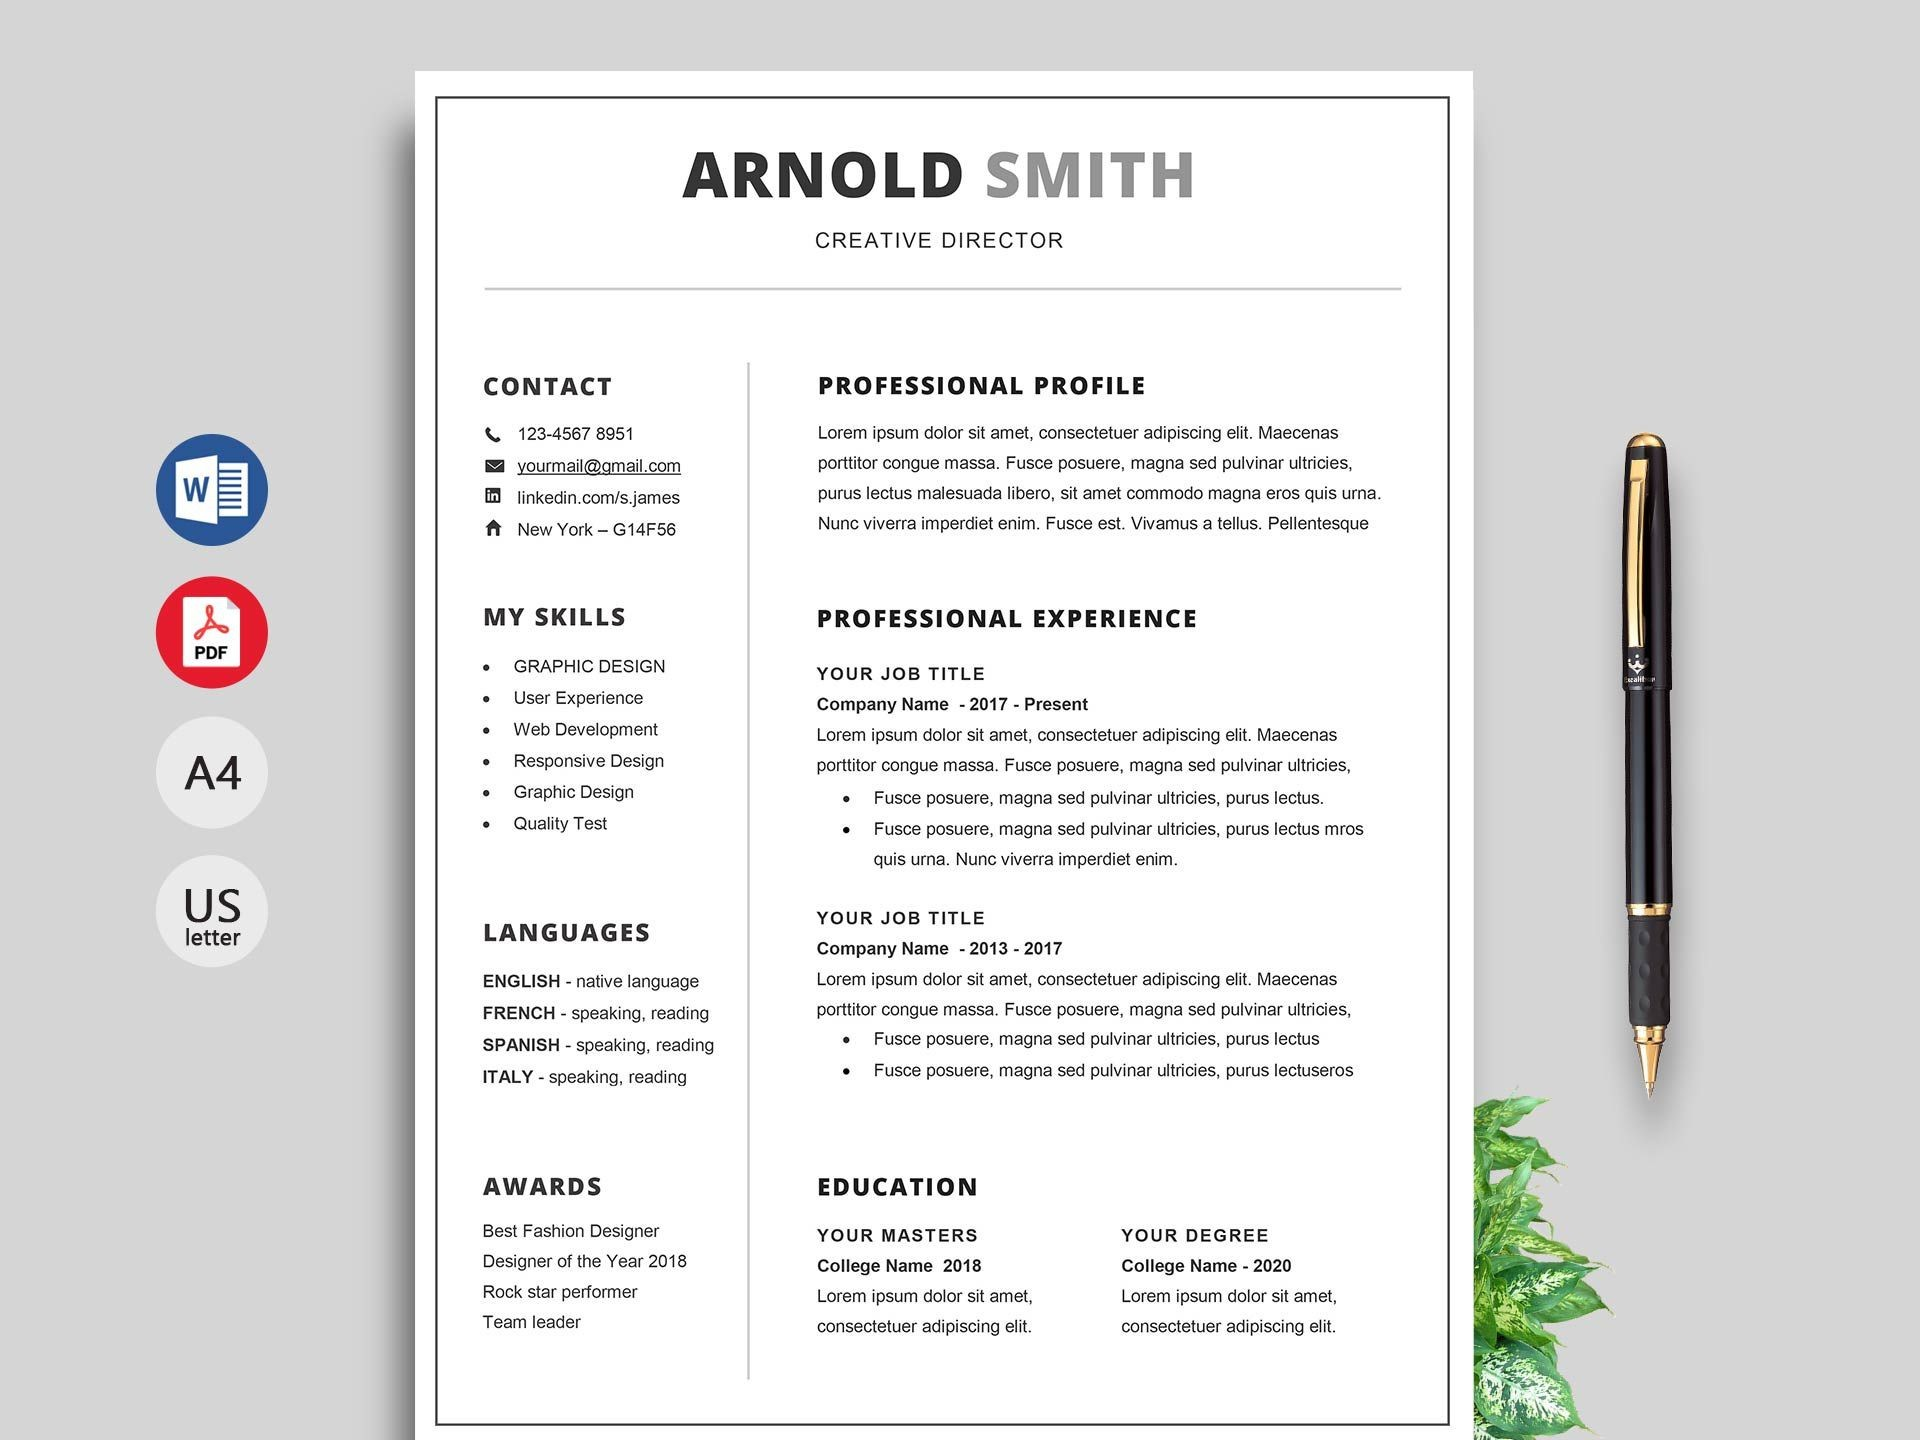 007 Dreaded Free Resume Template 2018 Printable Idea 1920